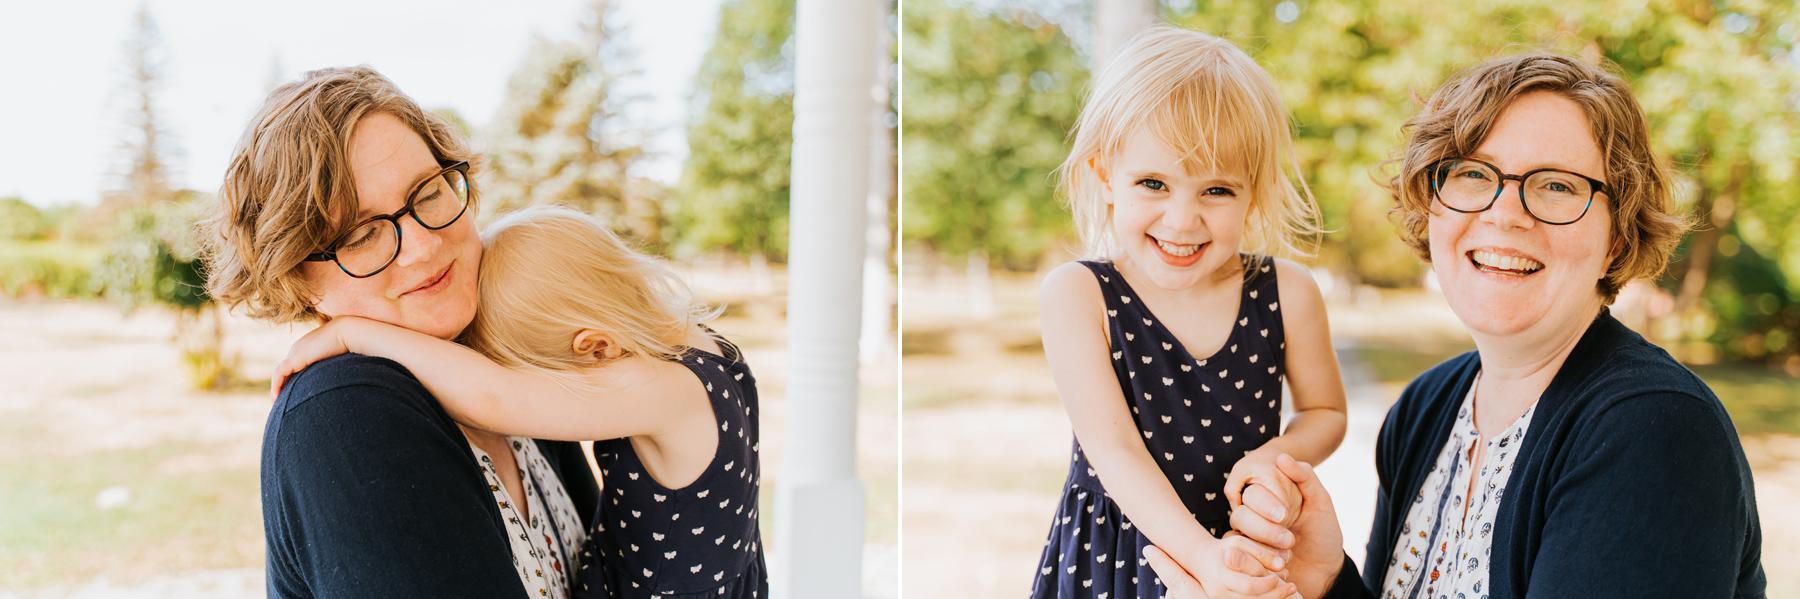 013-fredericton-family-portraits-SJVZG2020